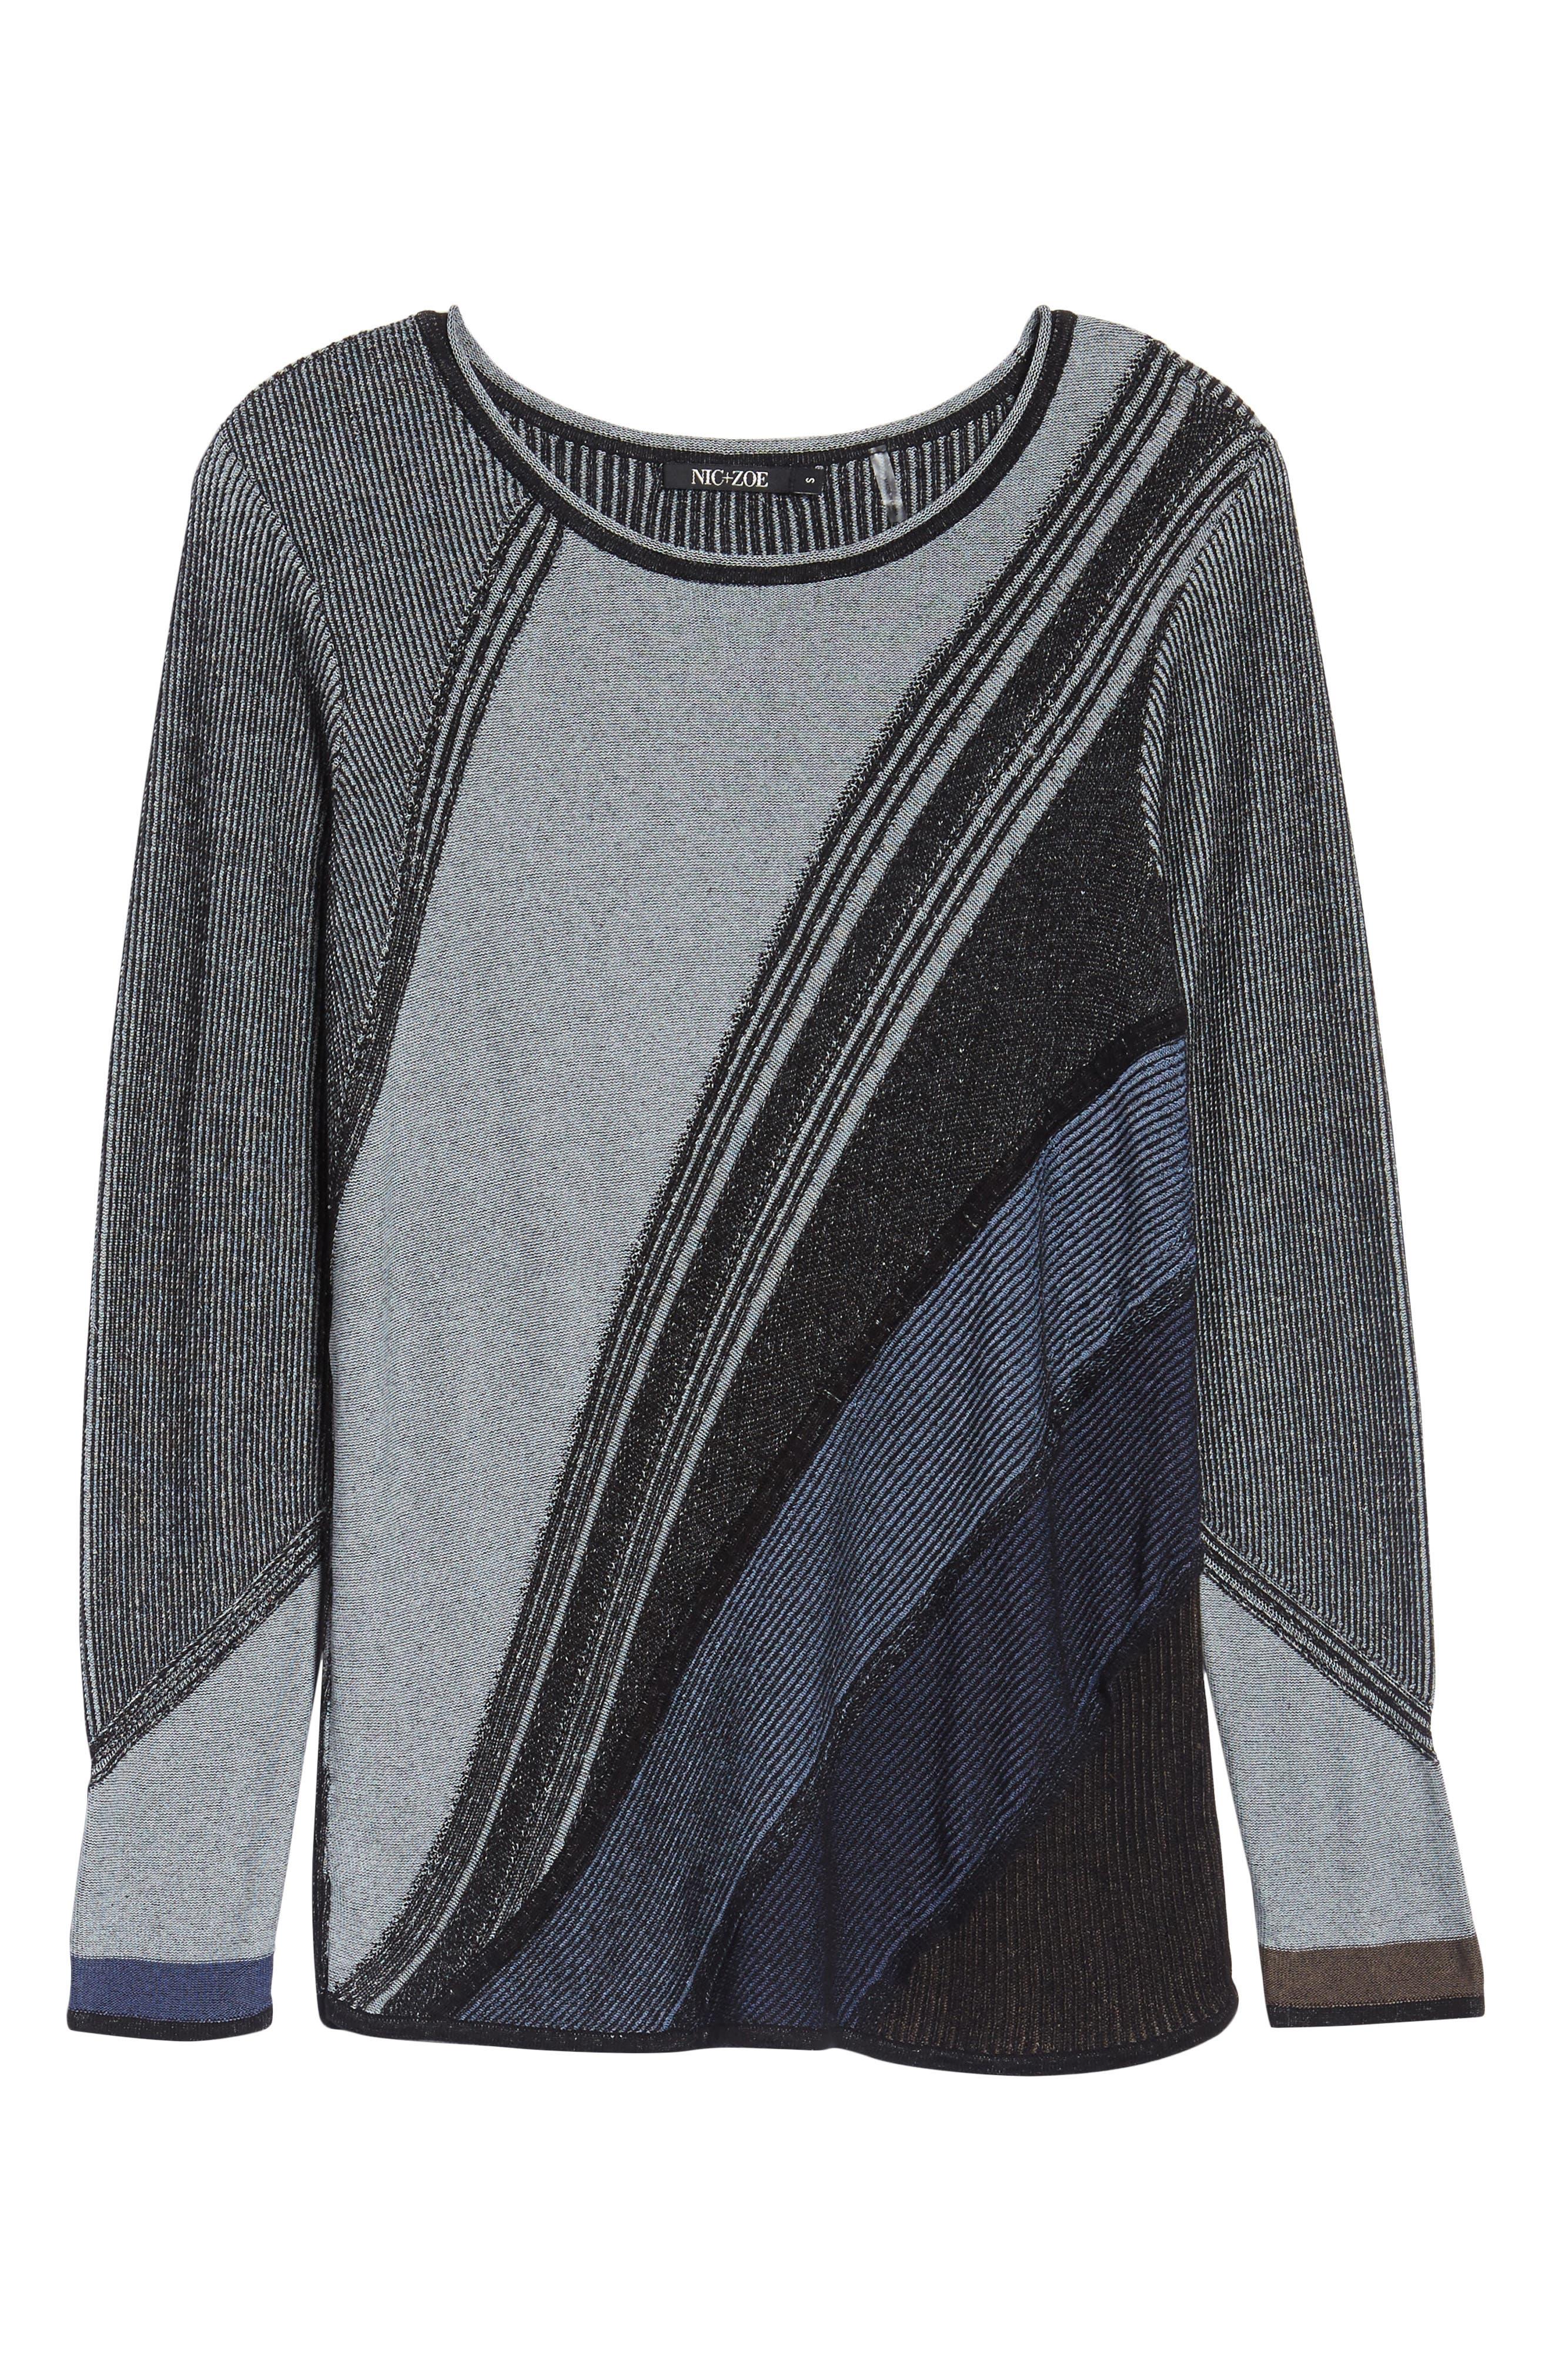 Blue Horizon Knit Top,                             Alternate thumbnail 6, color,                             499